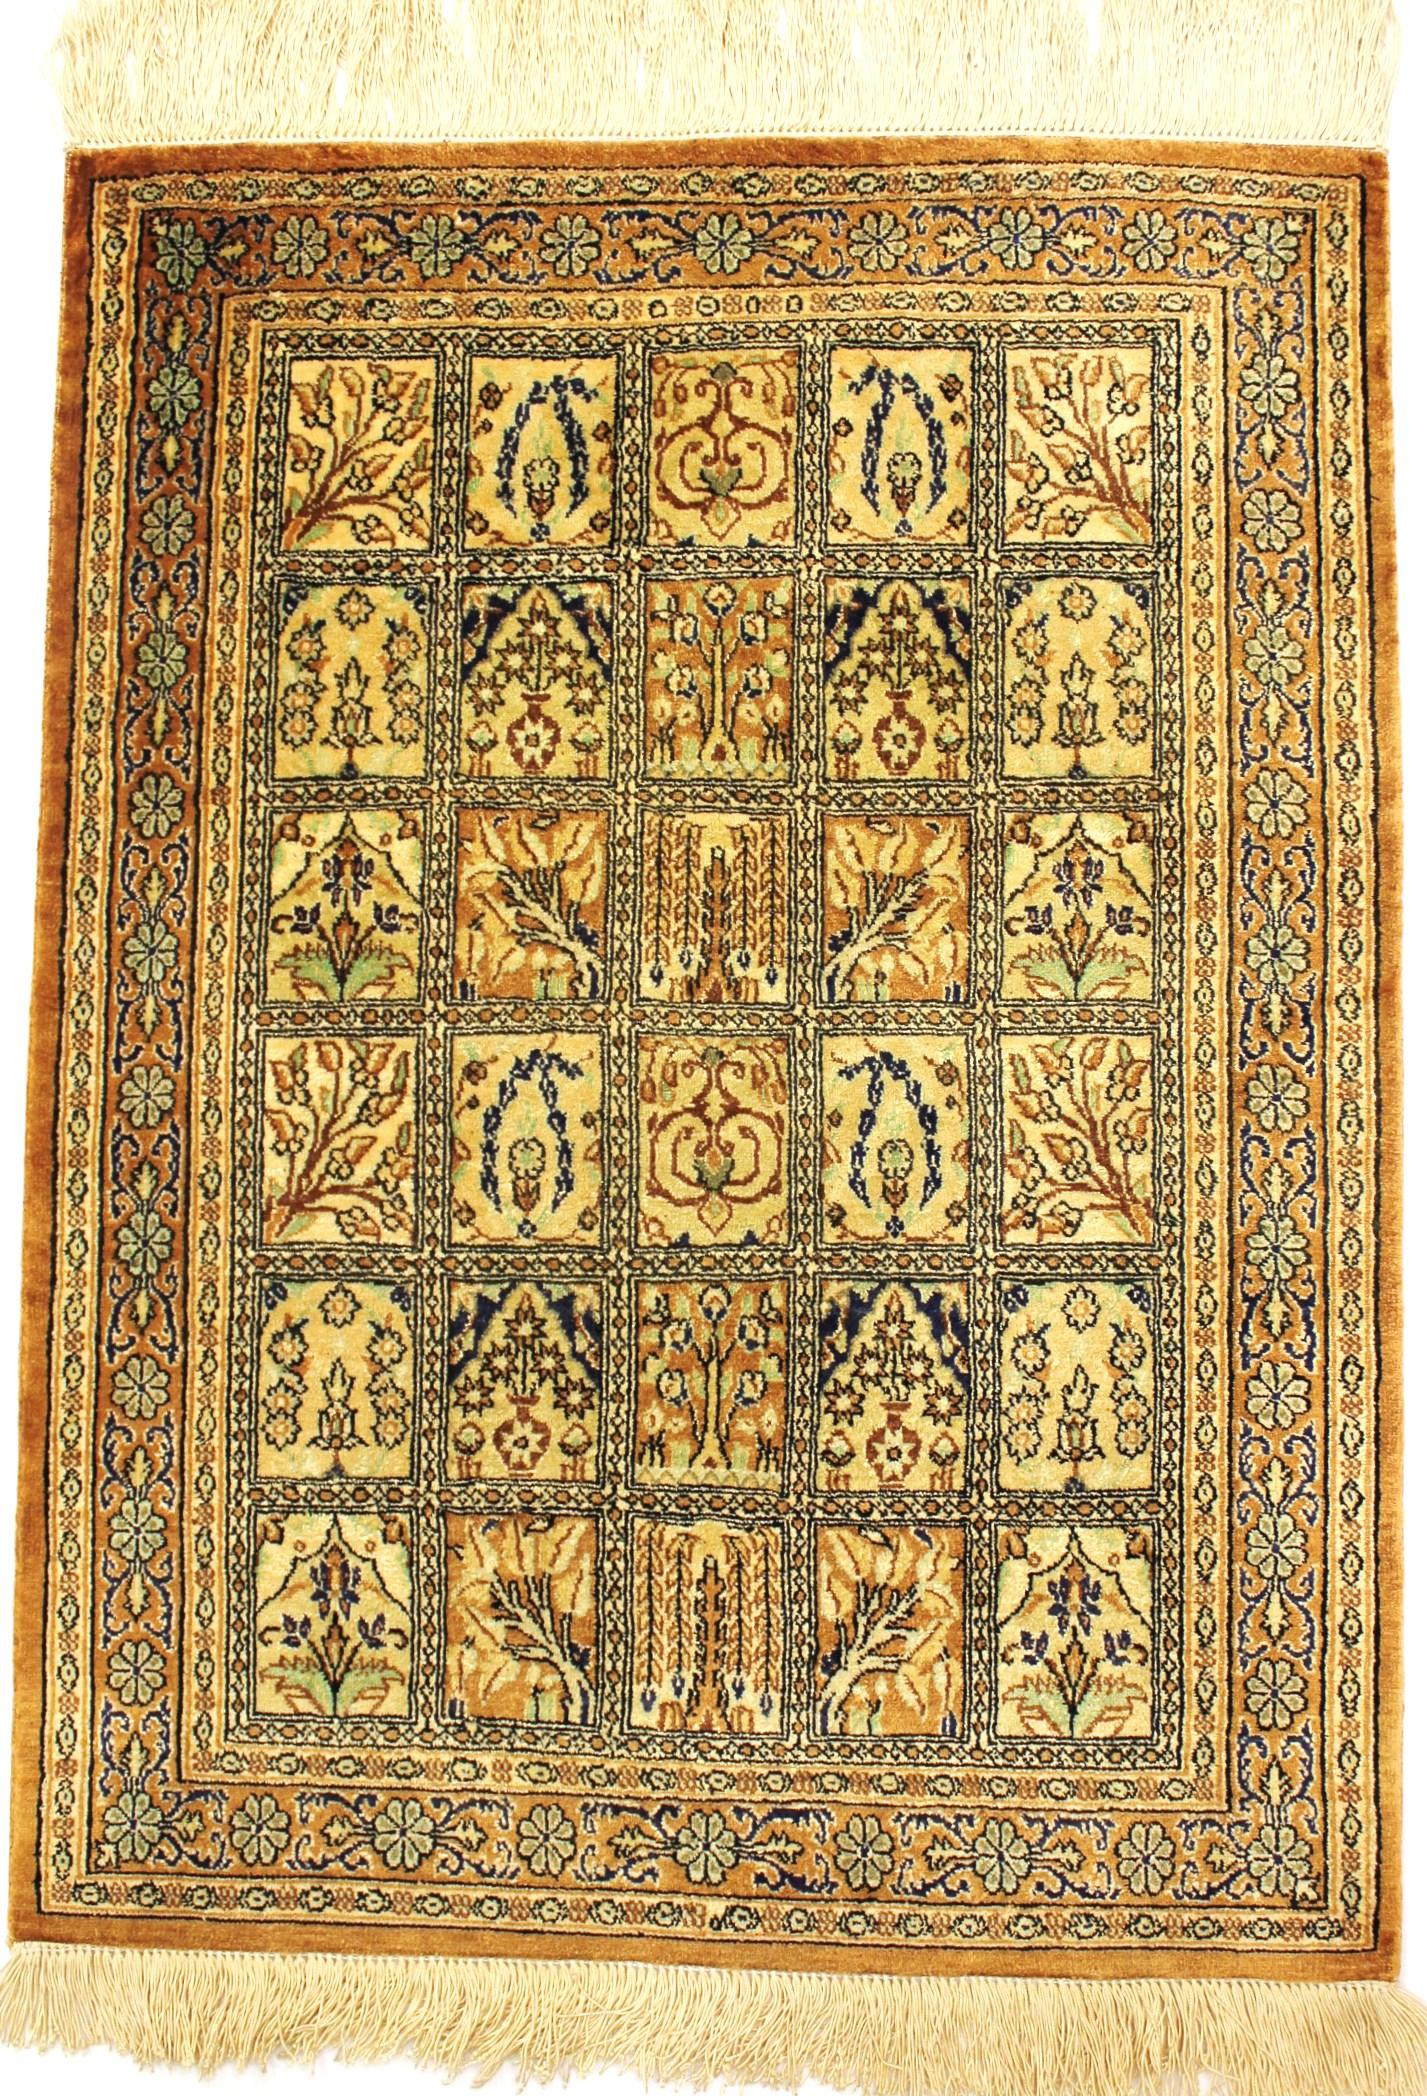 tapis persan ghoum soie 76x56 gobelins tapis. Black Bedroom Furniture Sets. Home Design Ideas